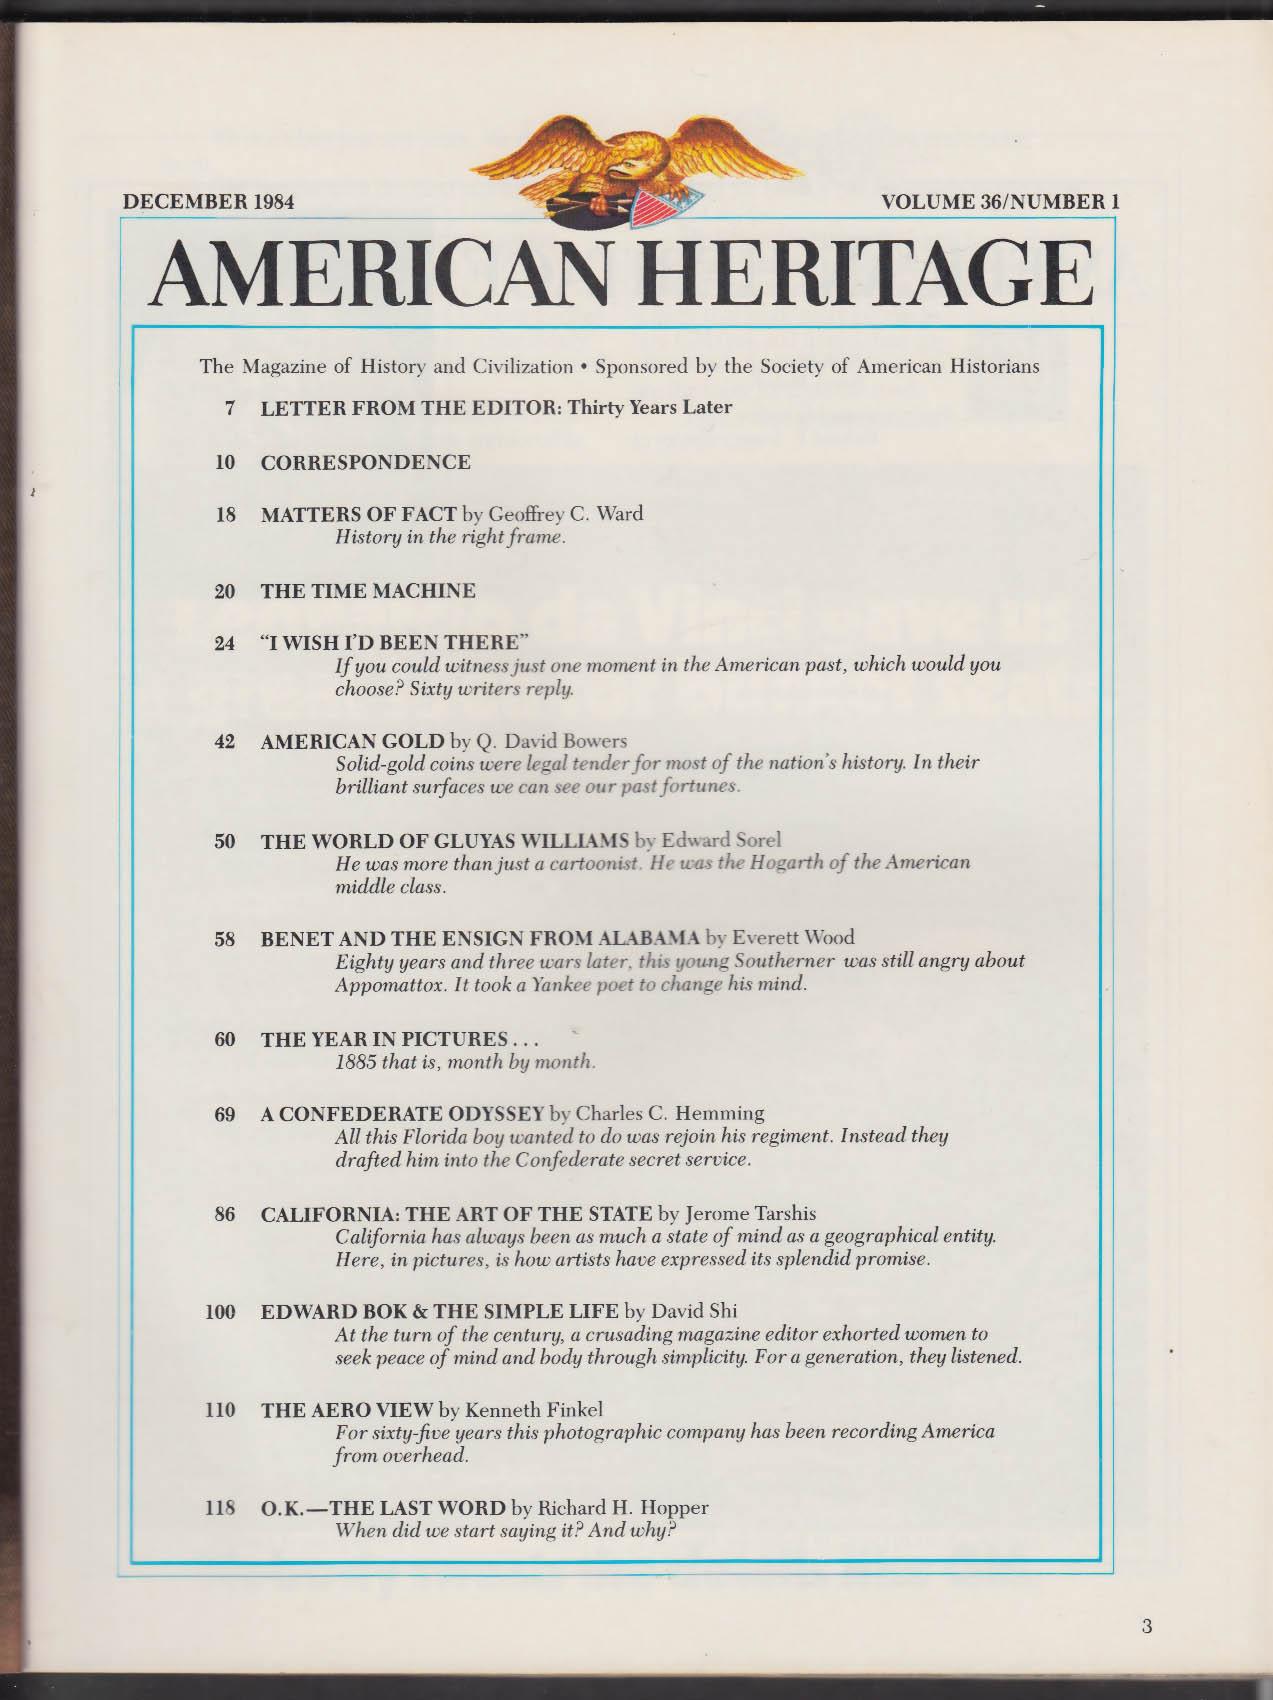 AMERICAN HERITAGE Gluyas Williams Edward Bok Everett Wood + 12 1984